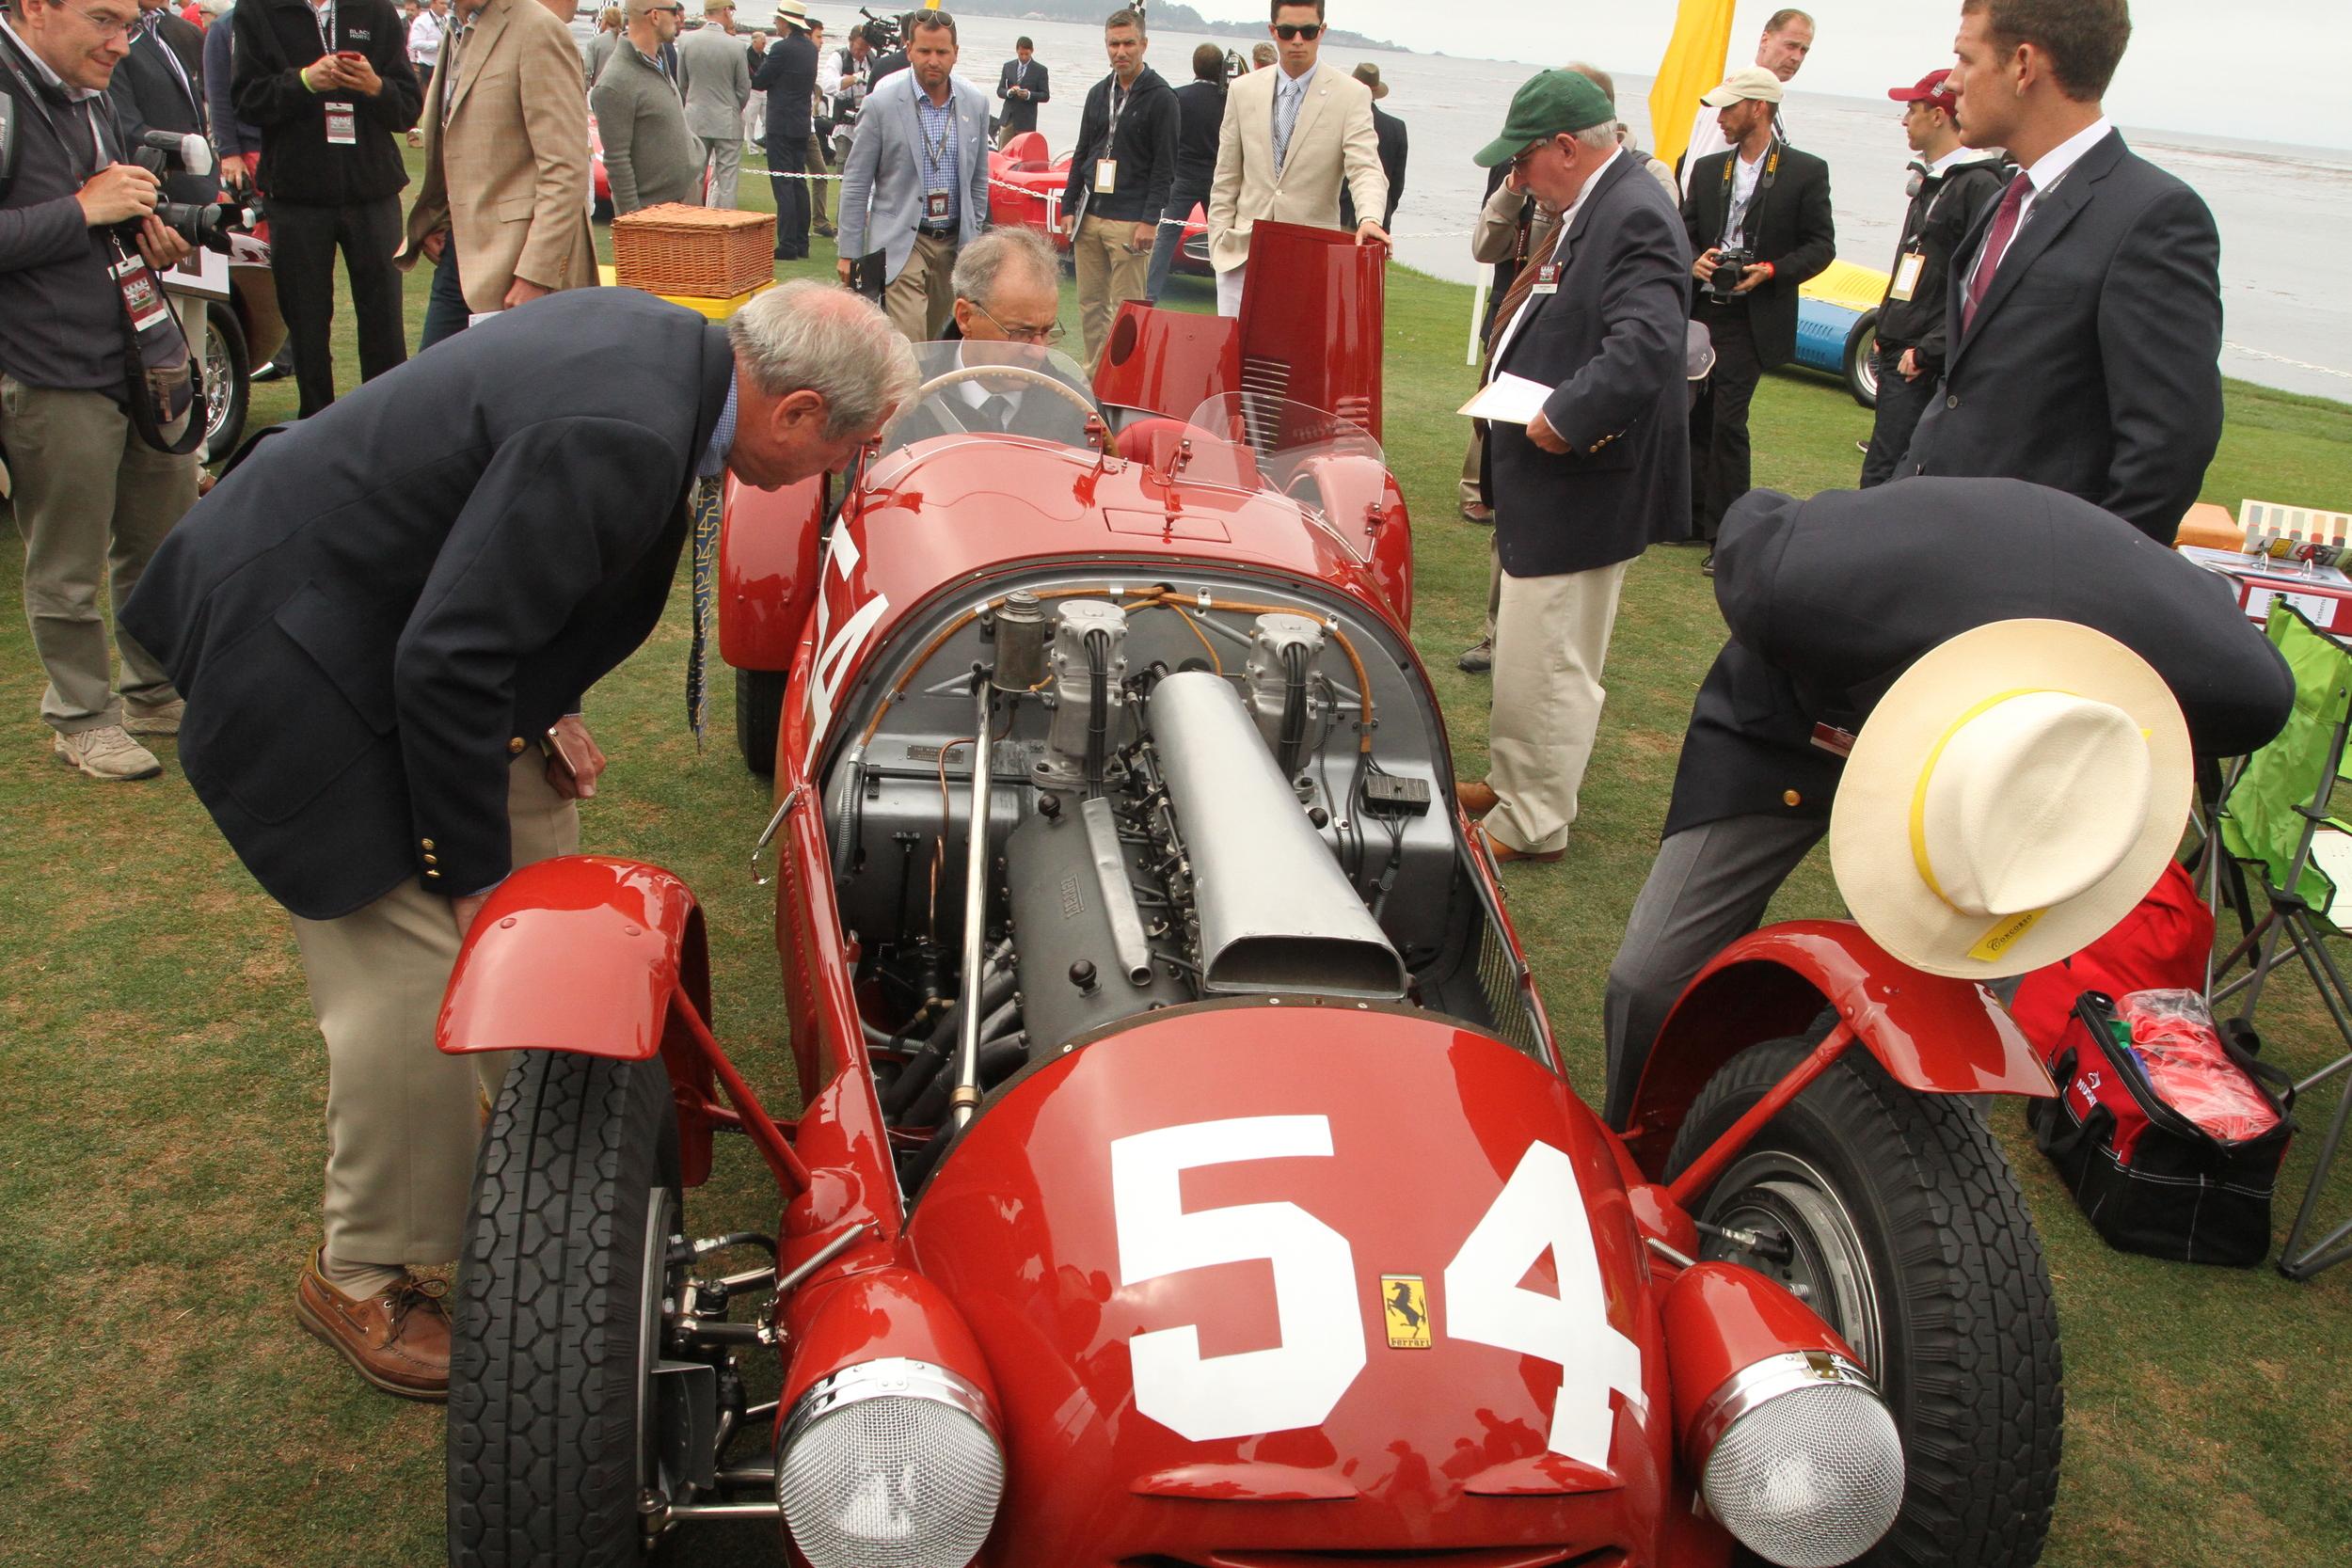 1948 Ferrari 166 Corsa Spyder